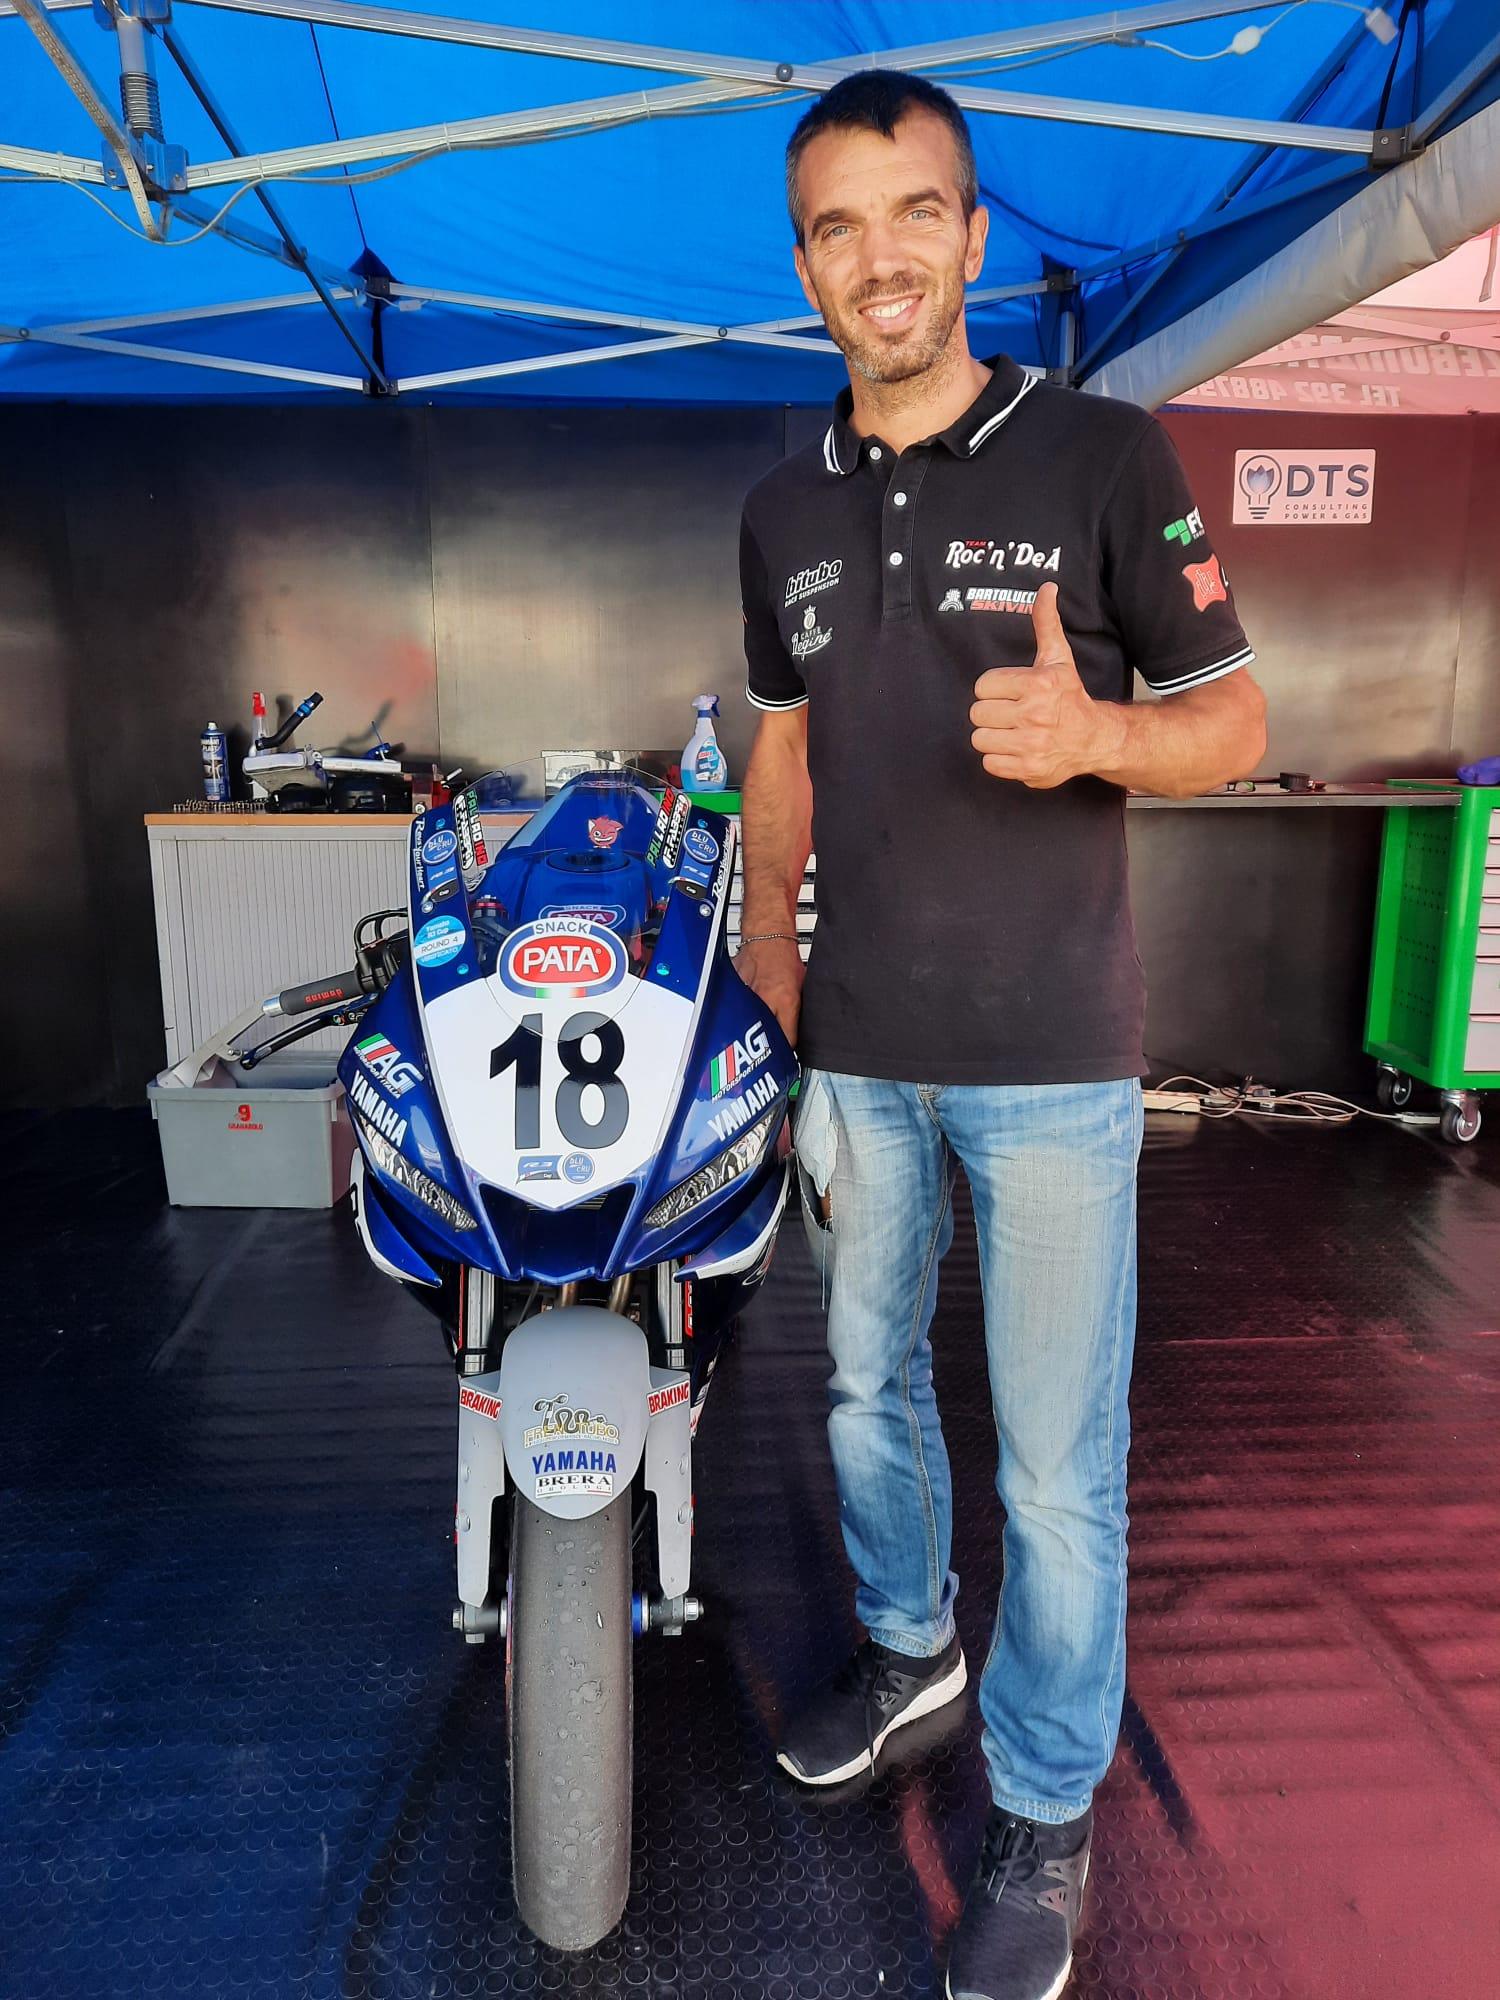 Il team Roc'n'Dea ha vinto la Yamaha R3 Cup